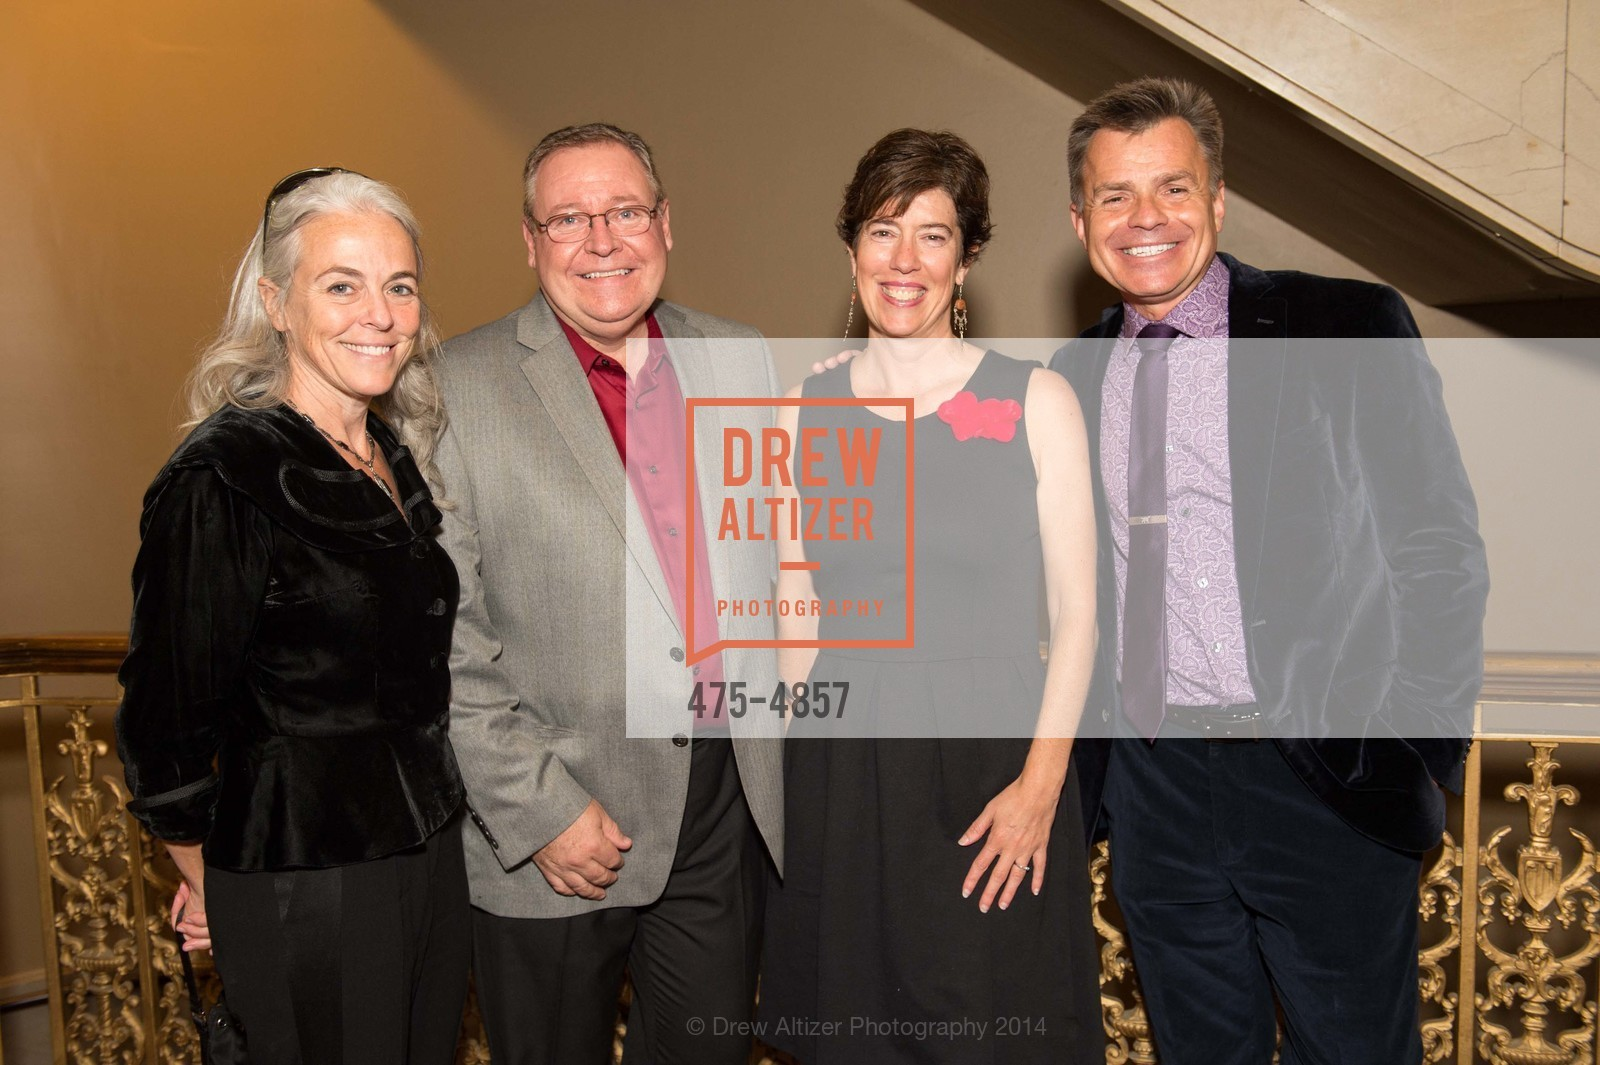 Sharon Tetlow, Mike Smith, Kristen Growney Yamamoto, Kevin Winge, Photo #475-4857